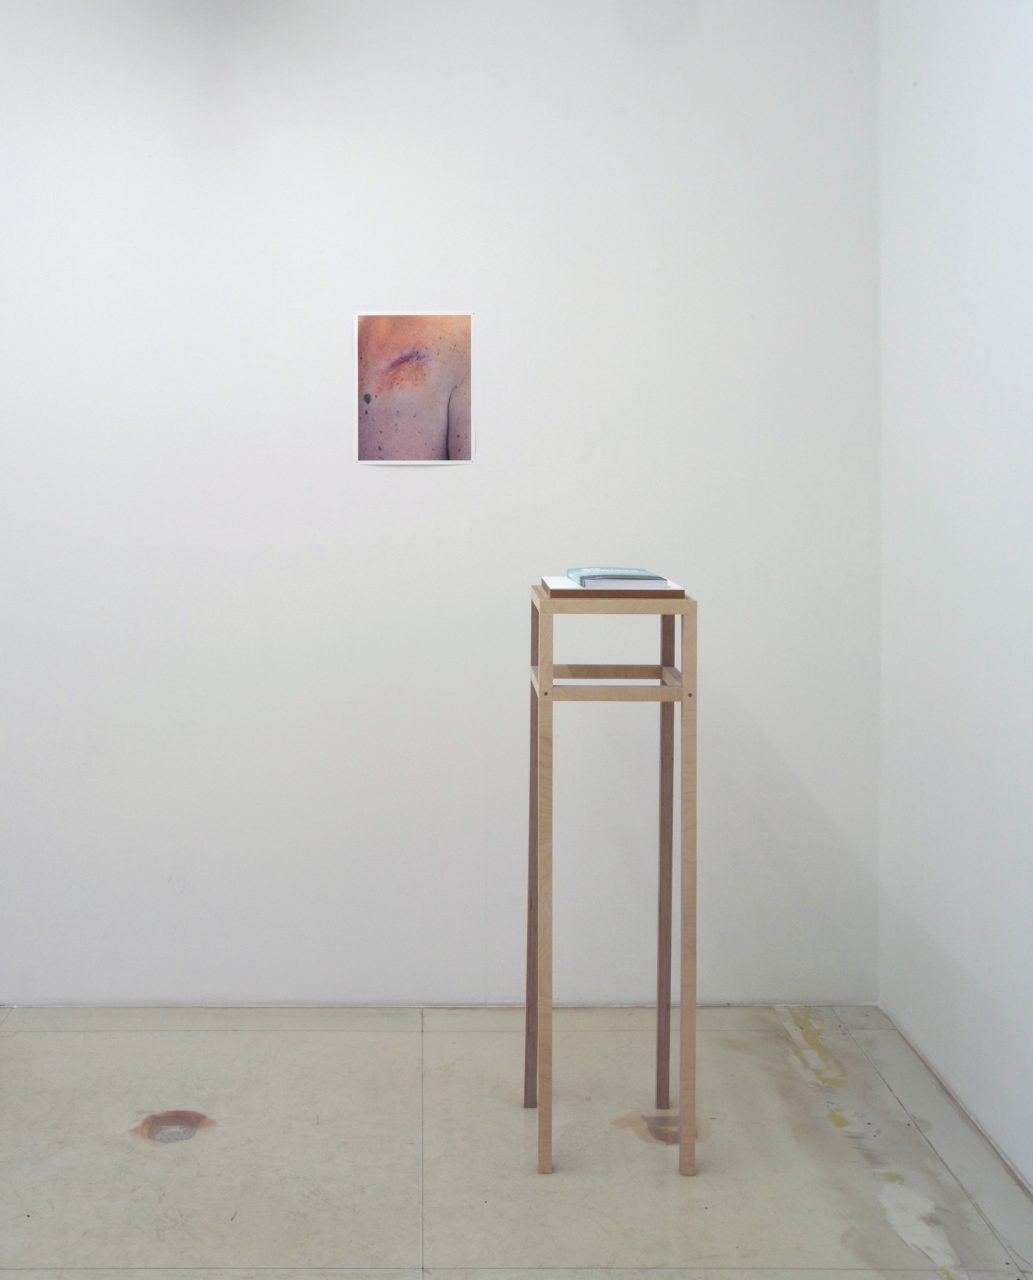 Die Übrigen, installation view, Diehl Cube, Berlin, Germany, 2015